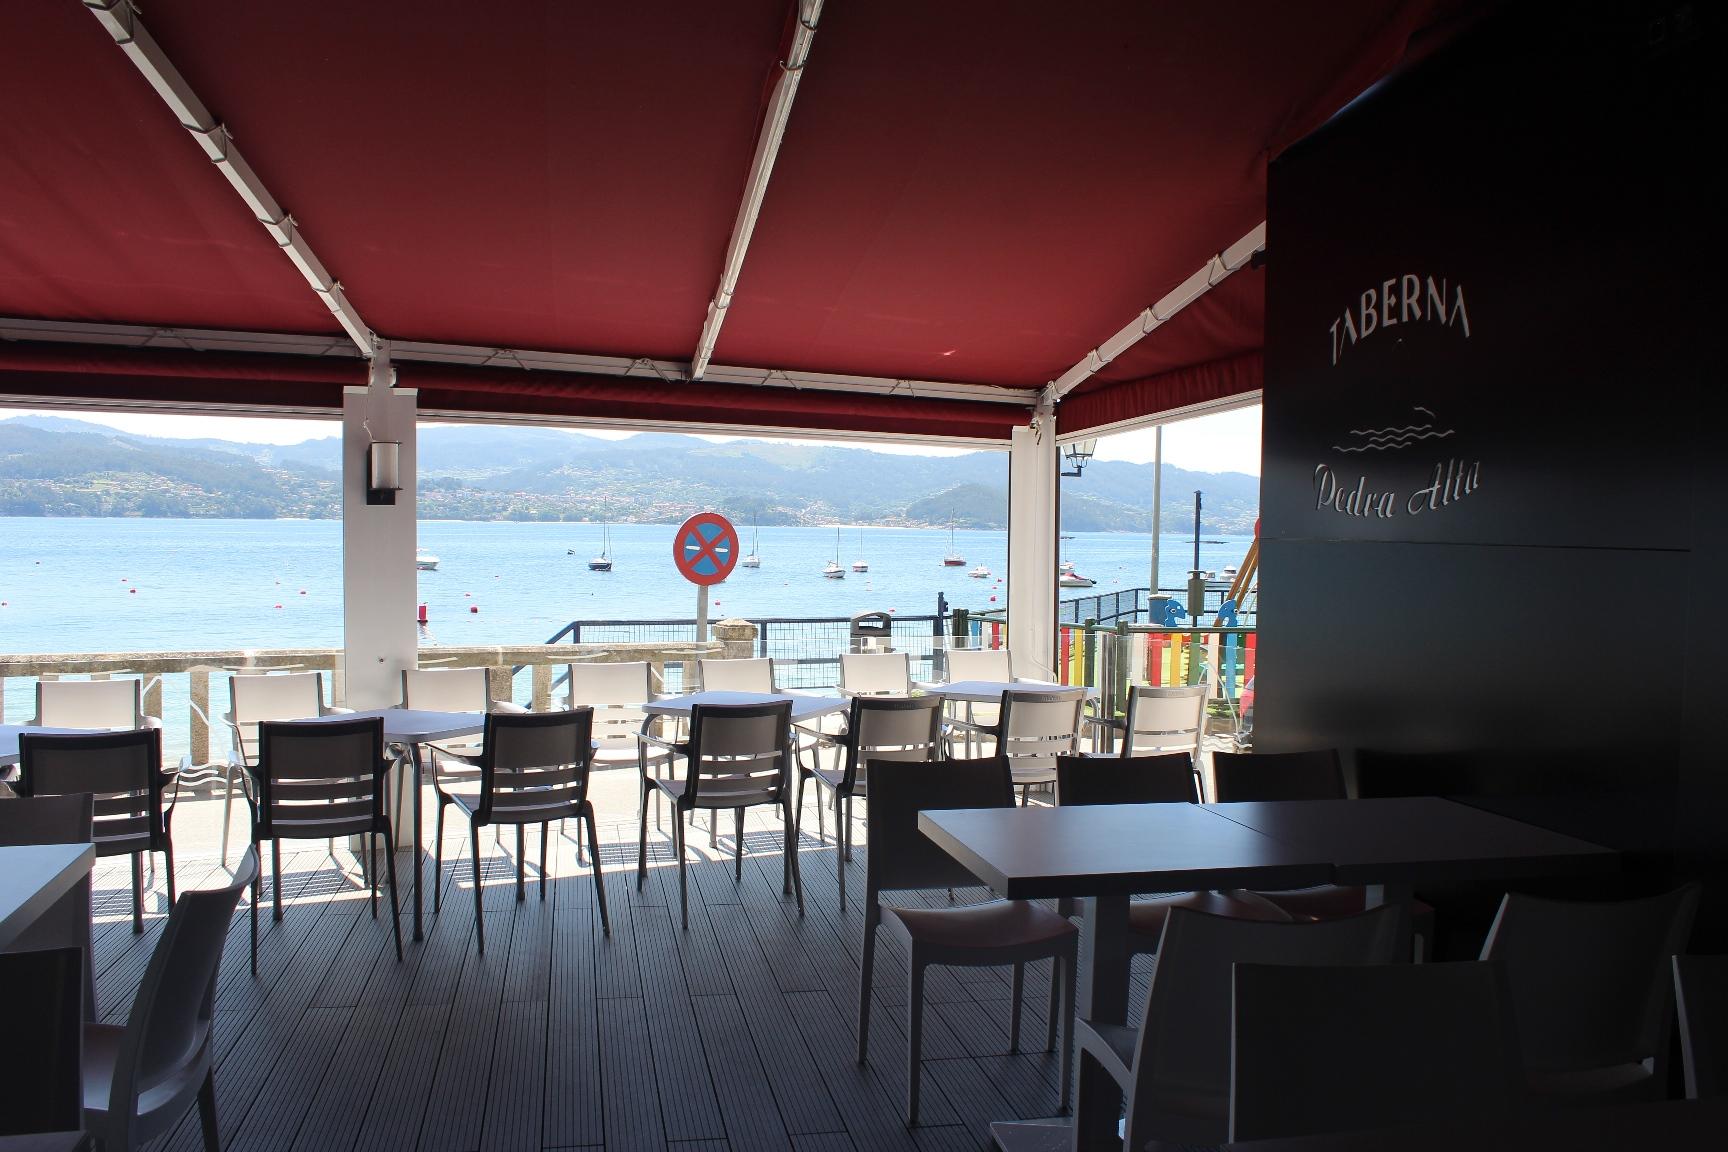 taberna-pedra-alta-restaurante-cocteleria-12